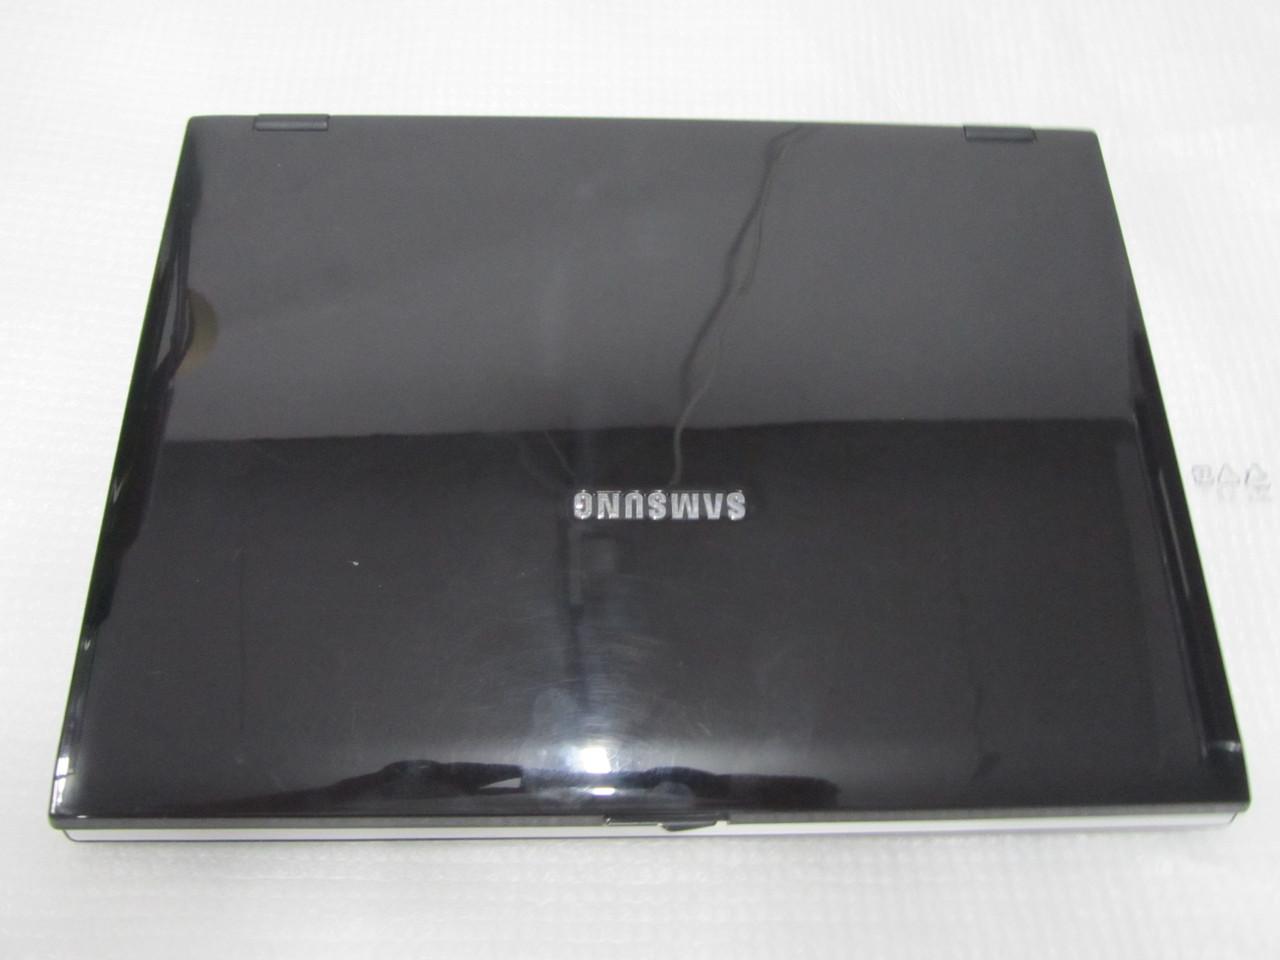 Двухъядерный ноутбук Samsung R60 plus Core 2 Duo 2.0 ГГц, 250 ГБ